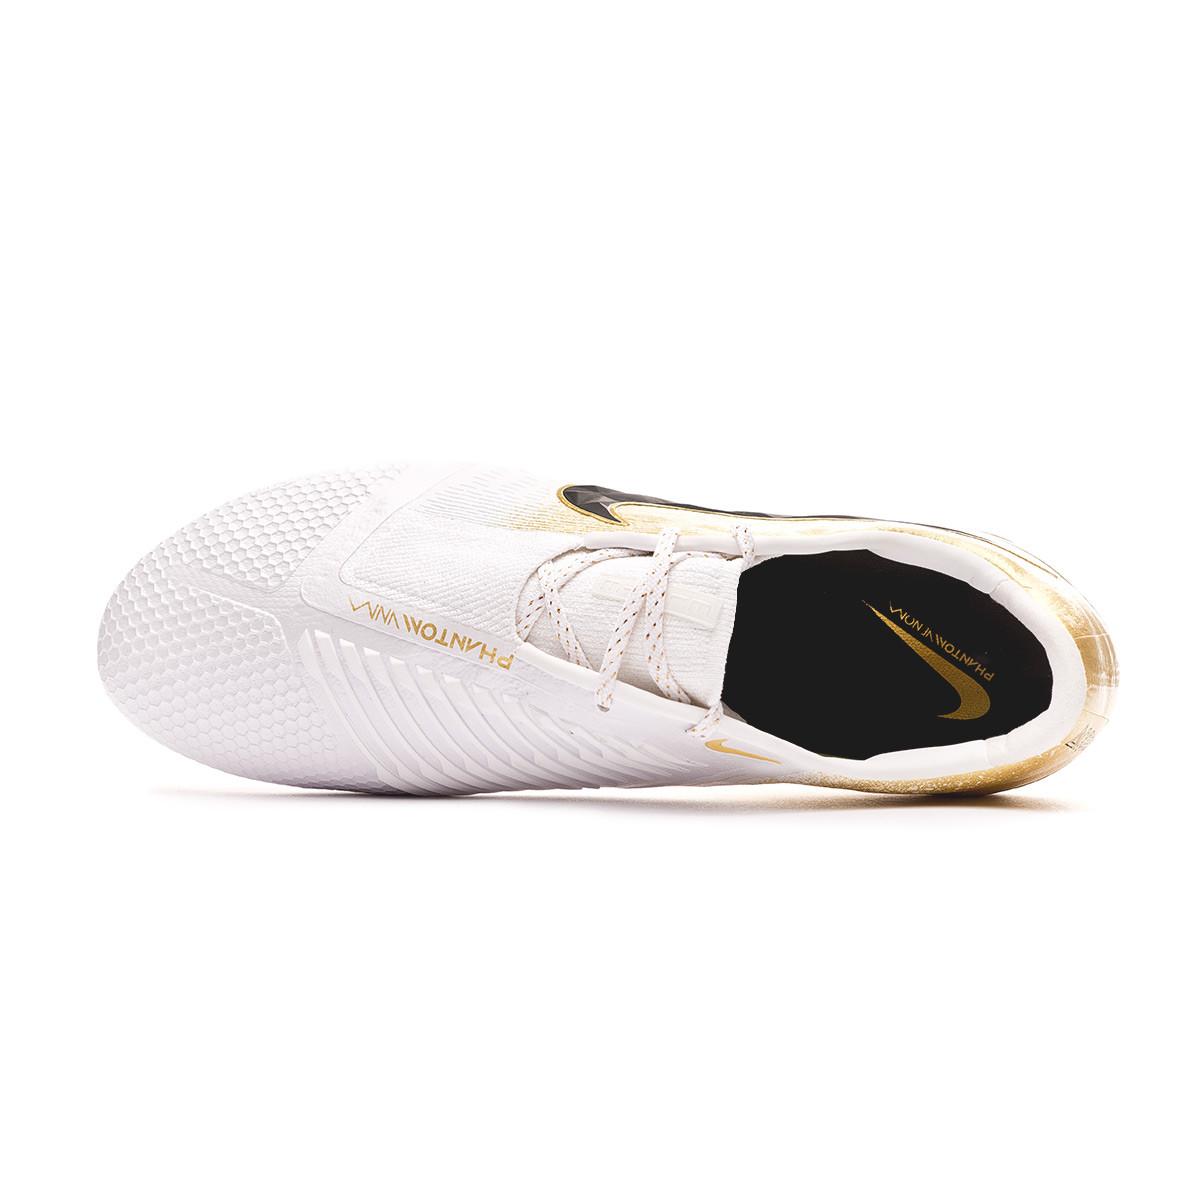 dc9c161a2 Football Boots Nike Phantom Venom Elite FG Euphoria Mode Champagne gold -  Football store Fútbol Emotion